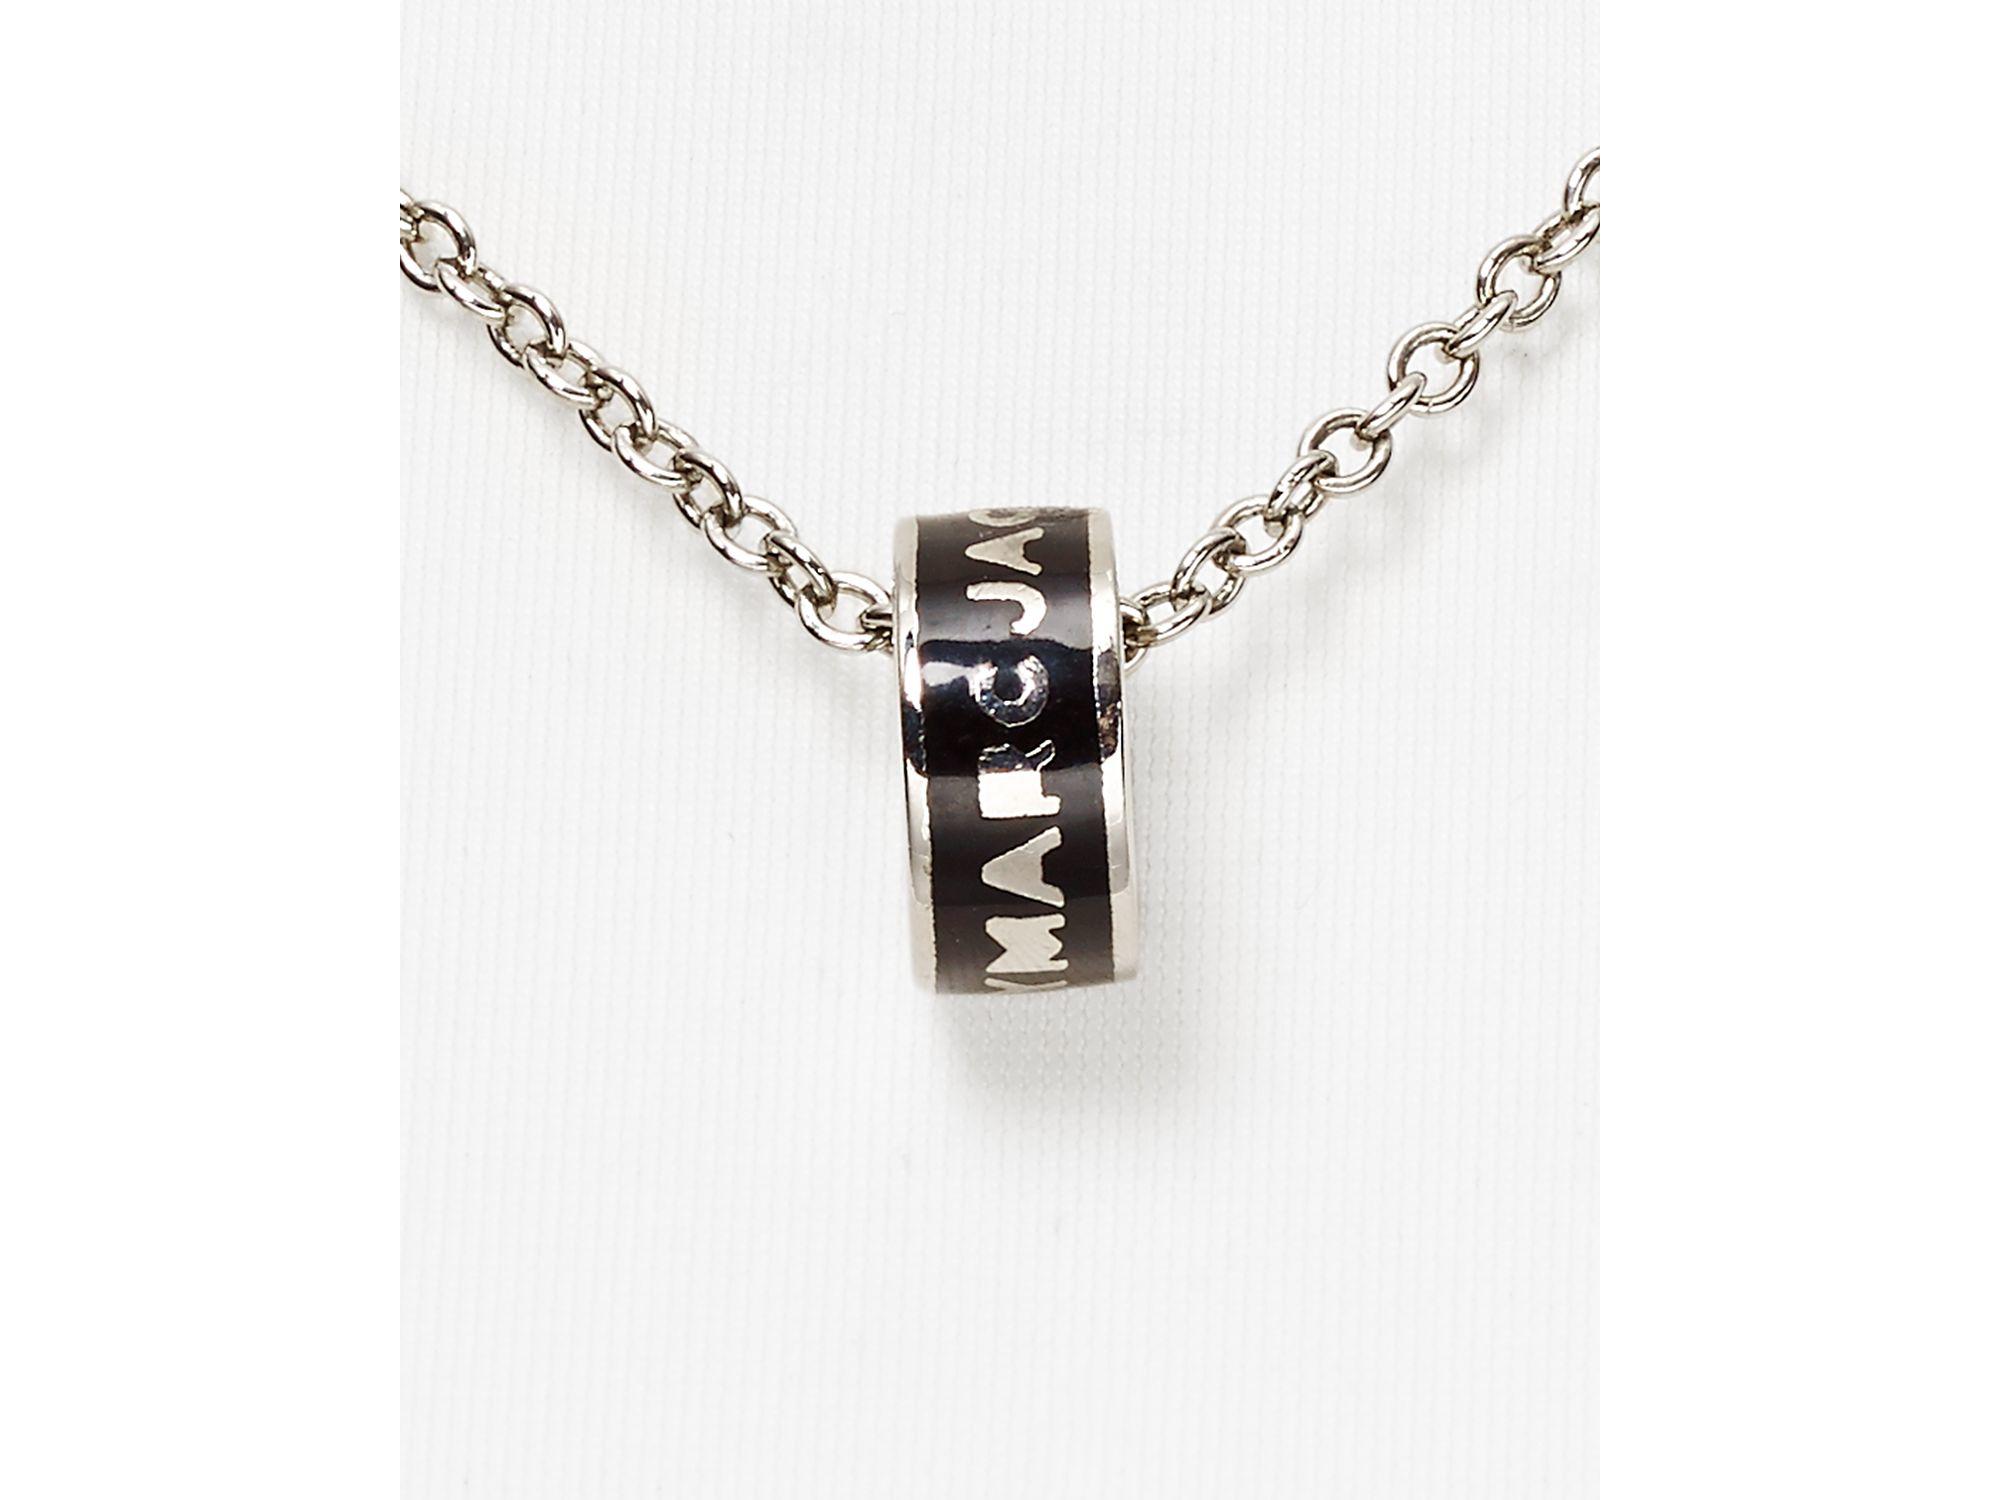 logo pendant bracelet - Metallic Marc Jacobs ucvZbc